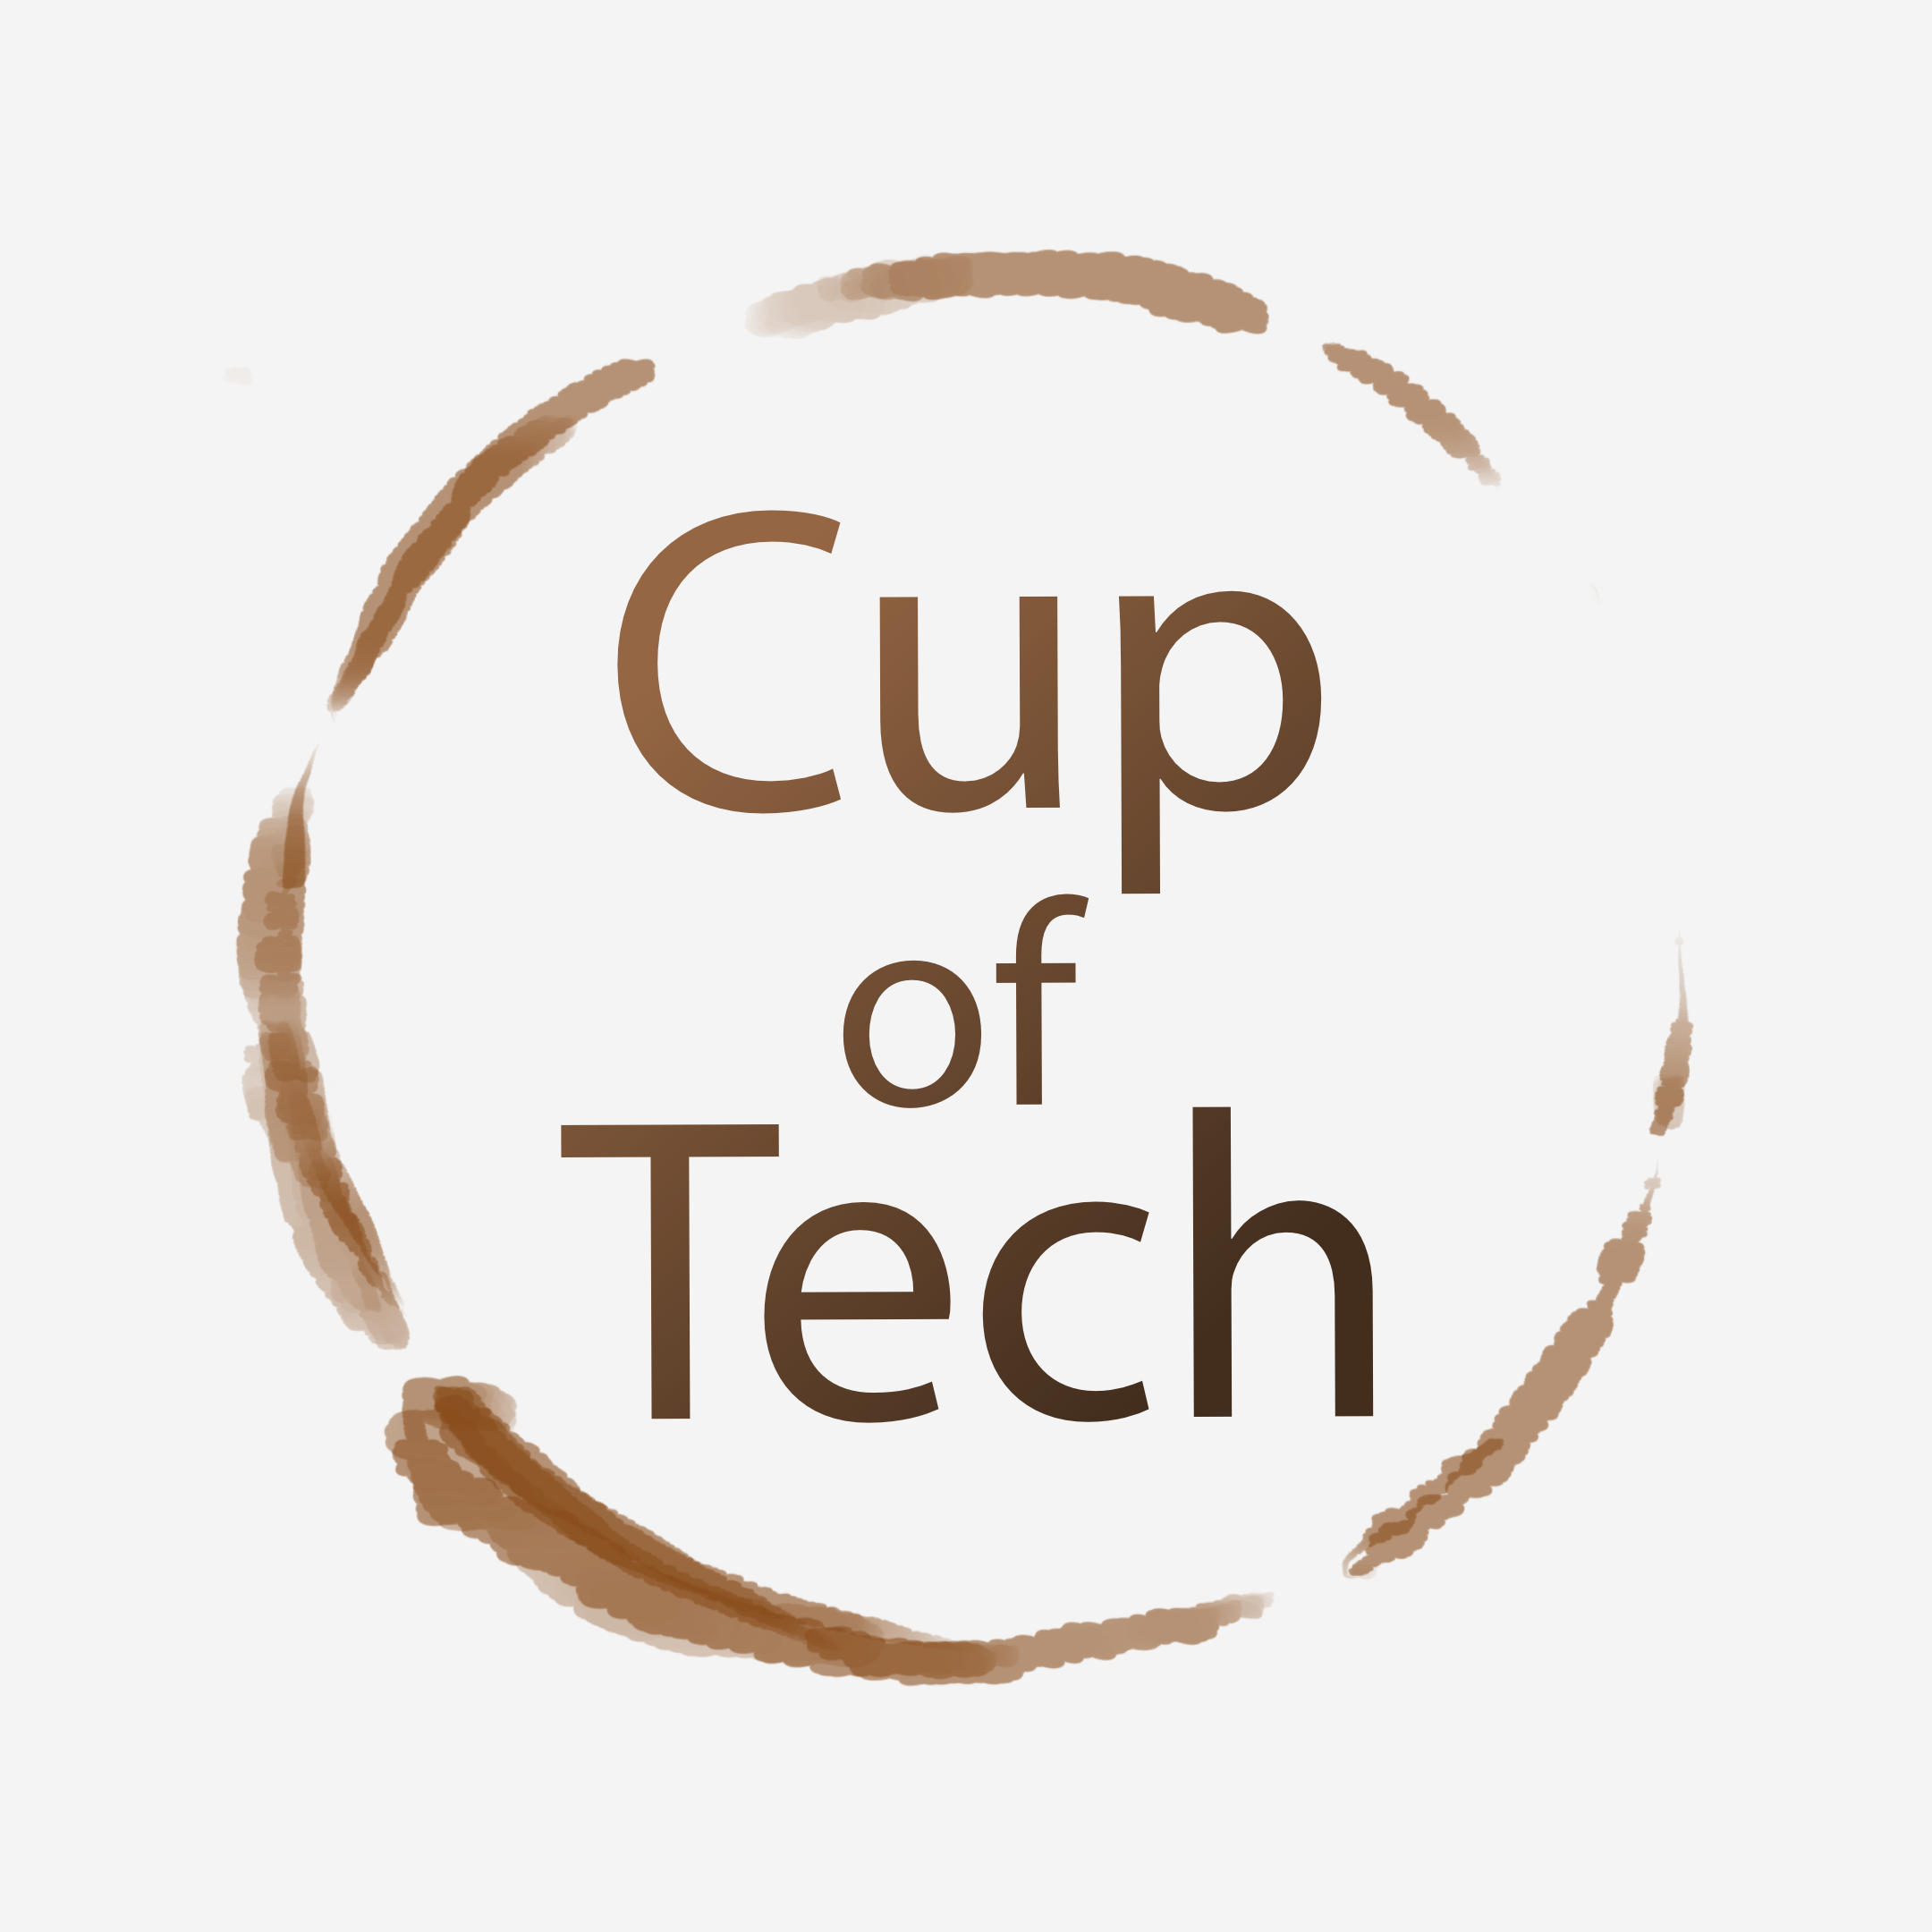 130: WWDC21 Predictions – Respect & Boos